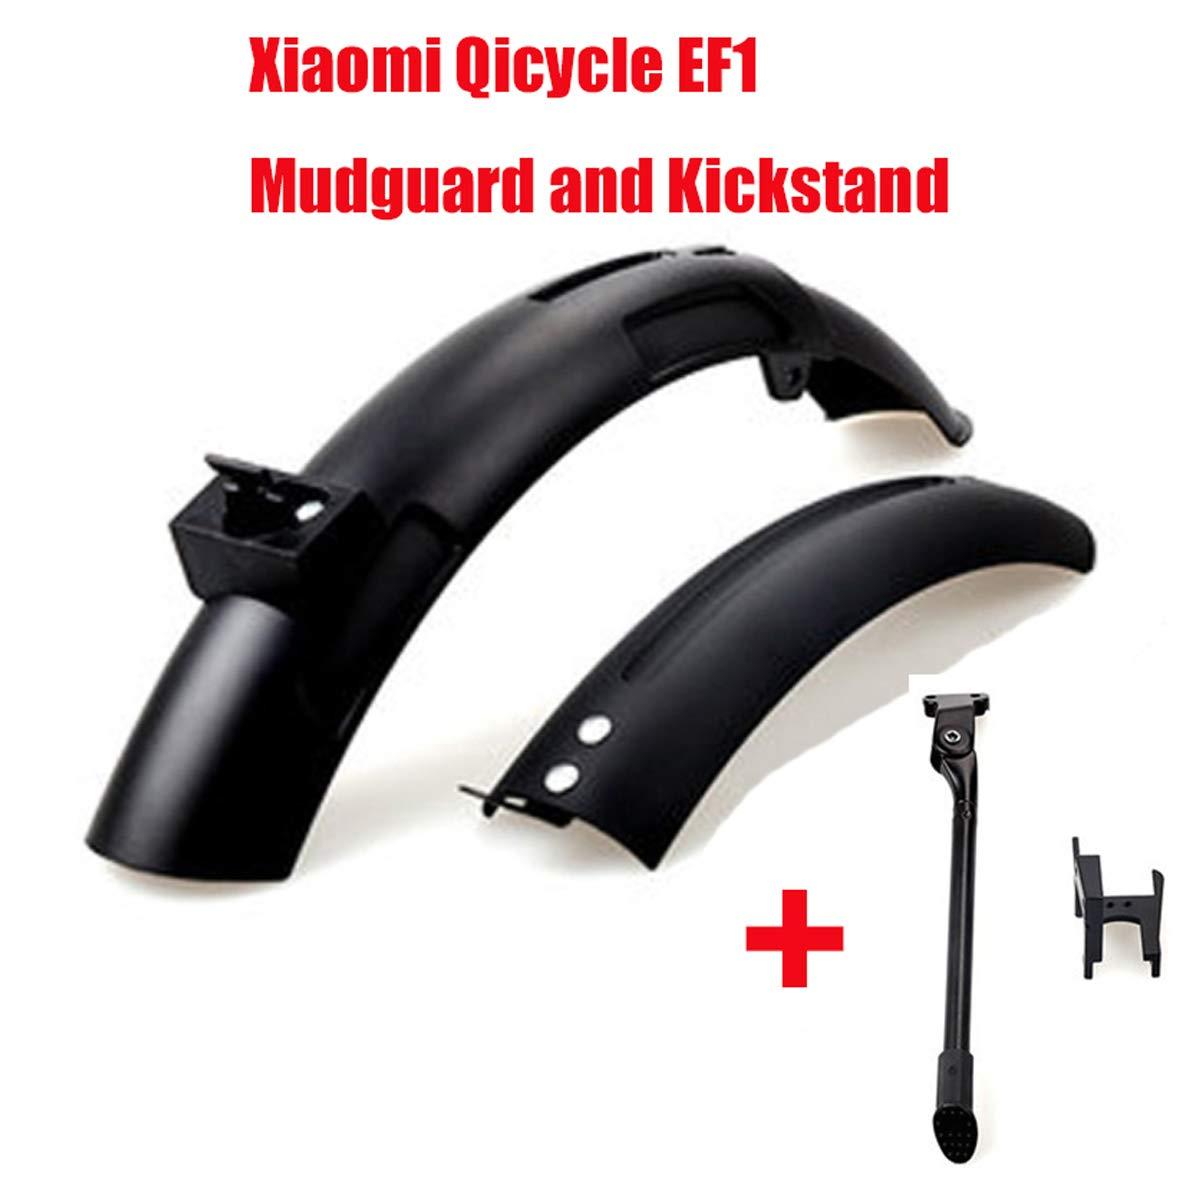 LEPAK - Guardabarros eléctrico para Bicicleta Xiaomi Qcycle EF1 ...